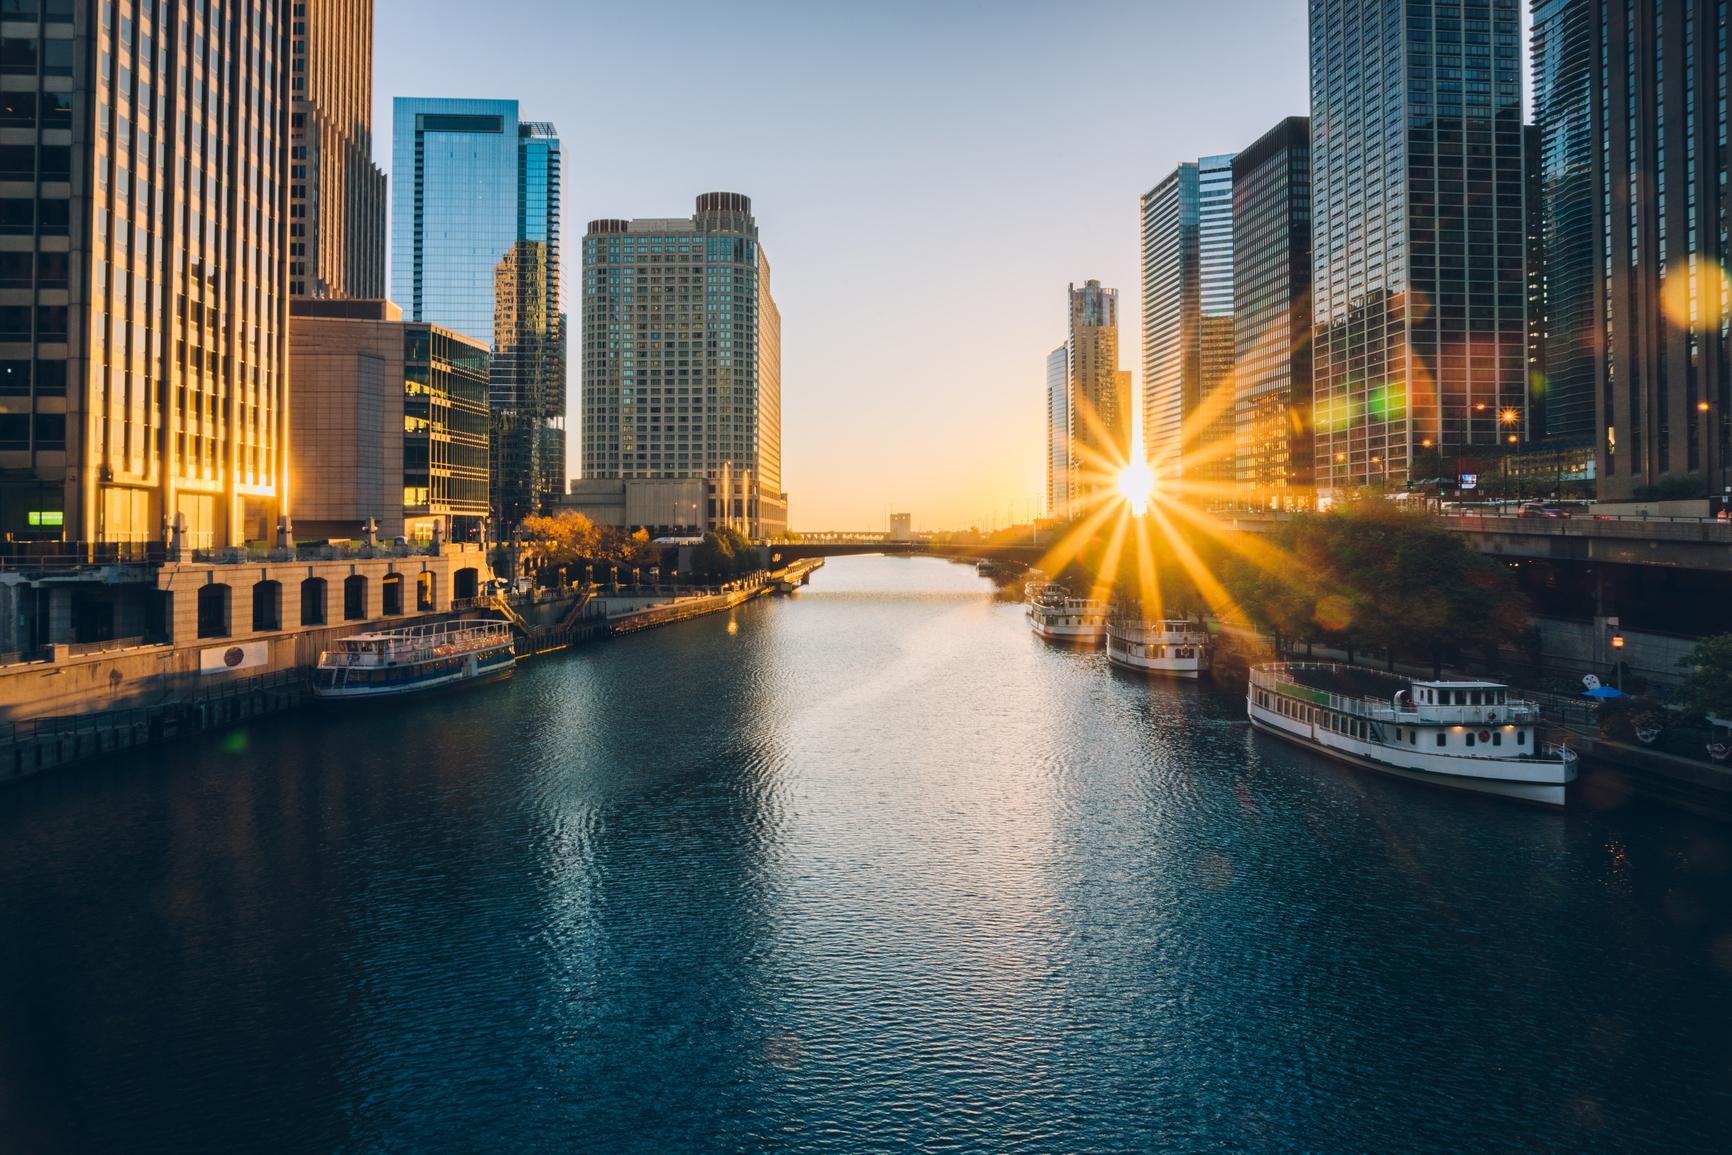 Sunrise through the city of chicago